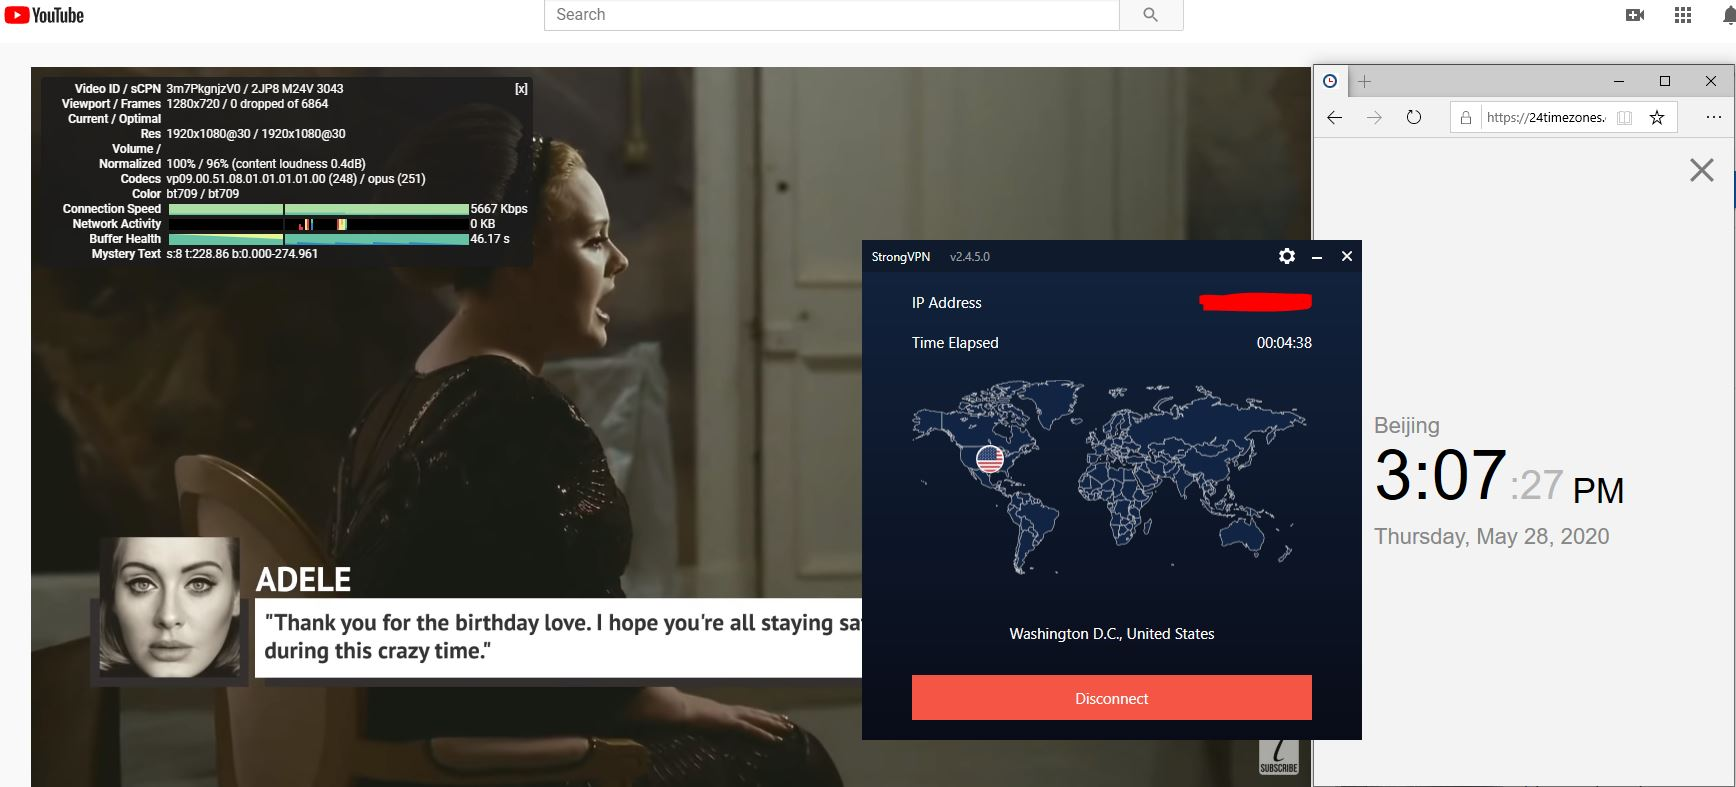 Windows10 StrongsVPN Washington DC - USA 中国VPN 翻墙 科学上网 测速-20200528